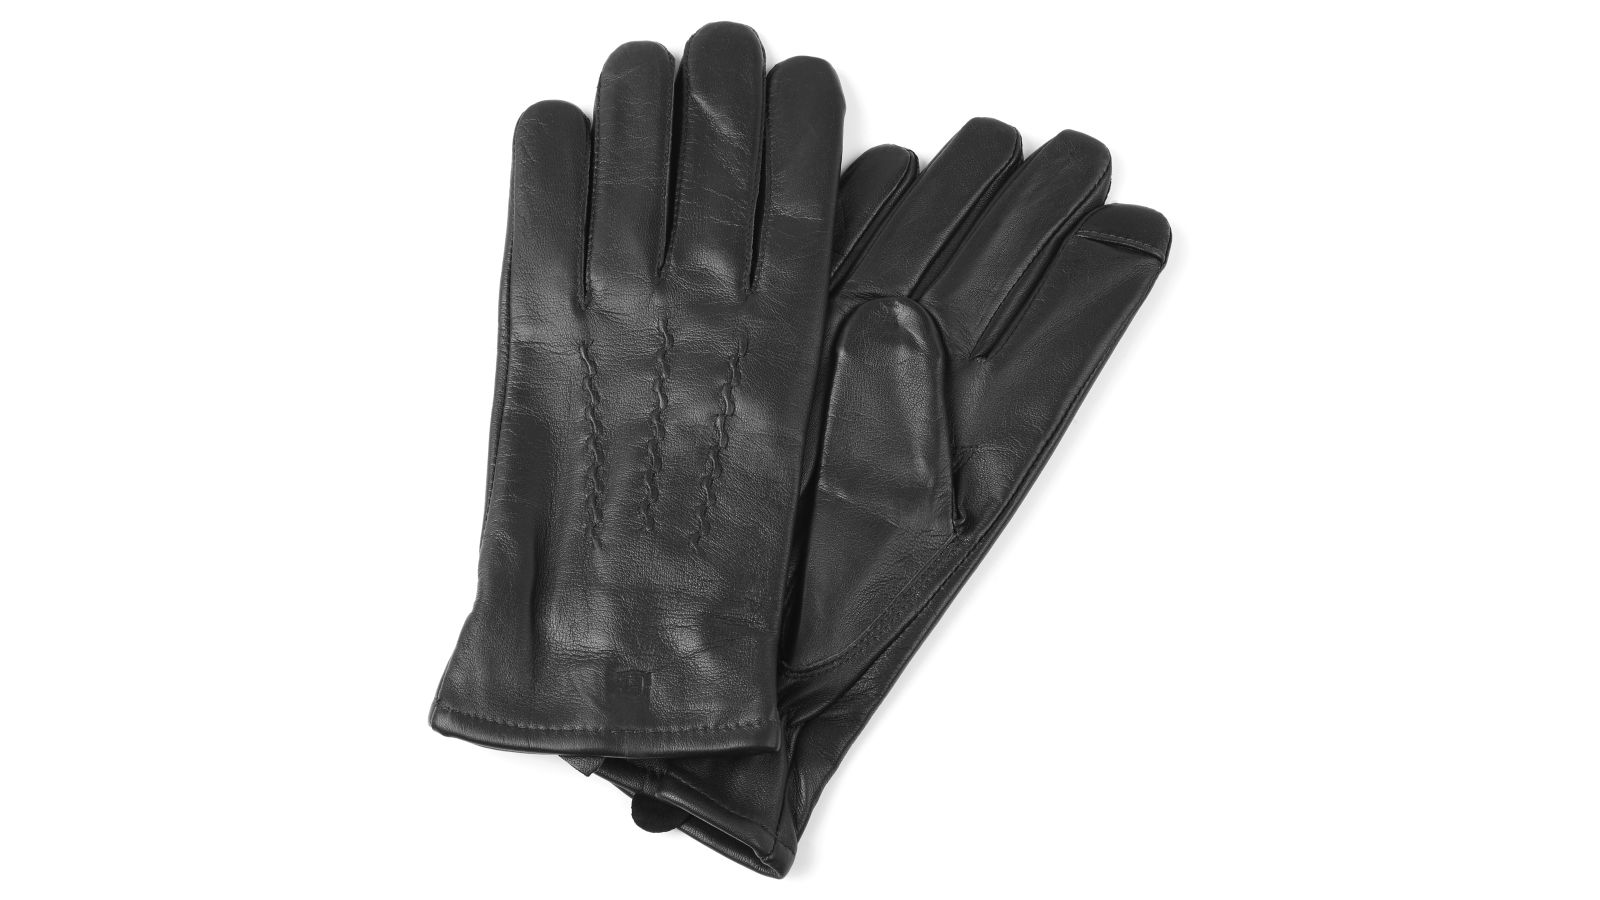 079ff6befe Μαύρα Δερμάτινα Γάντια